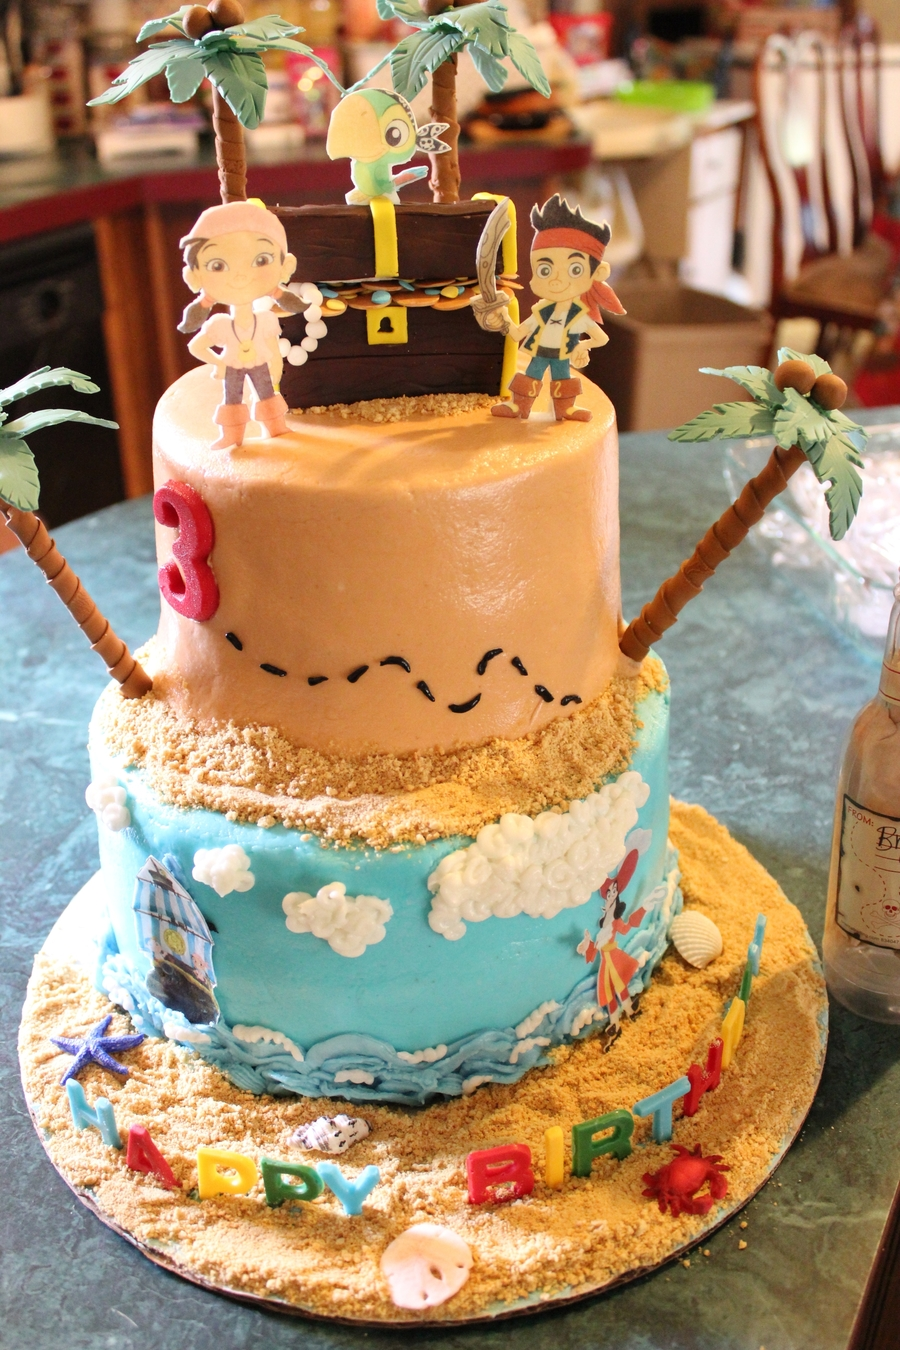 Cake Decorting Ideas Jake And The Neverland Pirates